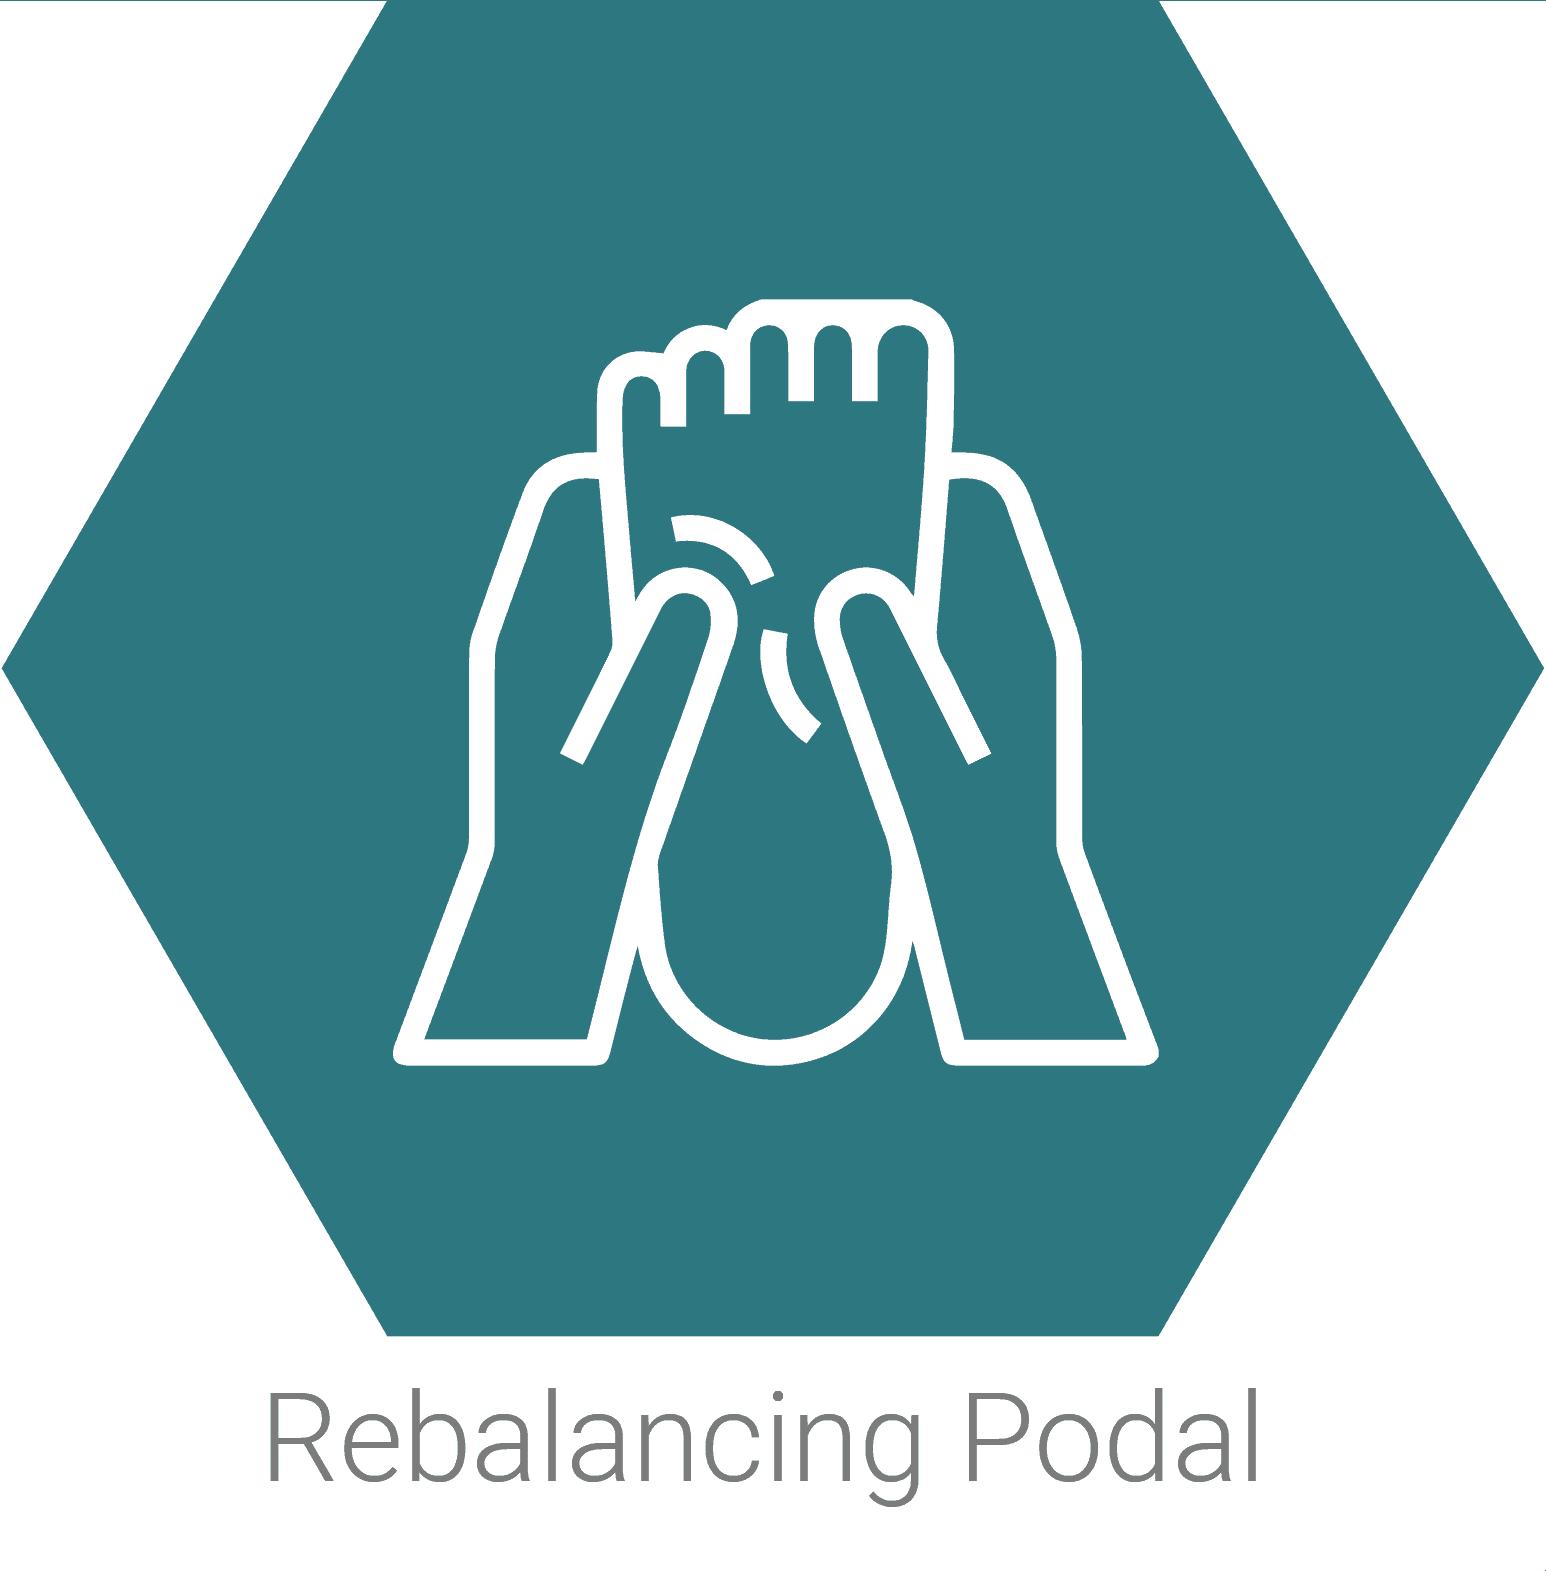 Rebalancing Podal